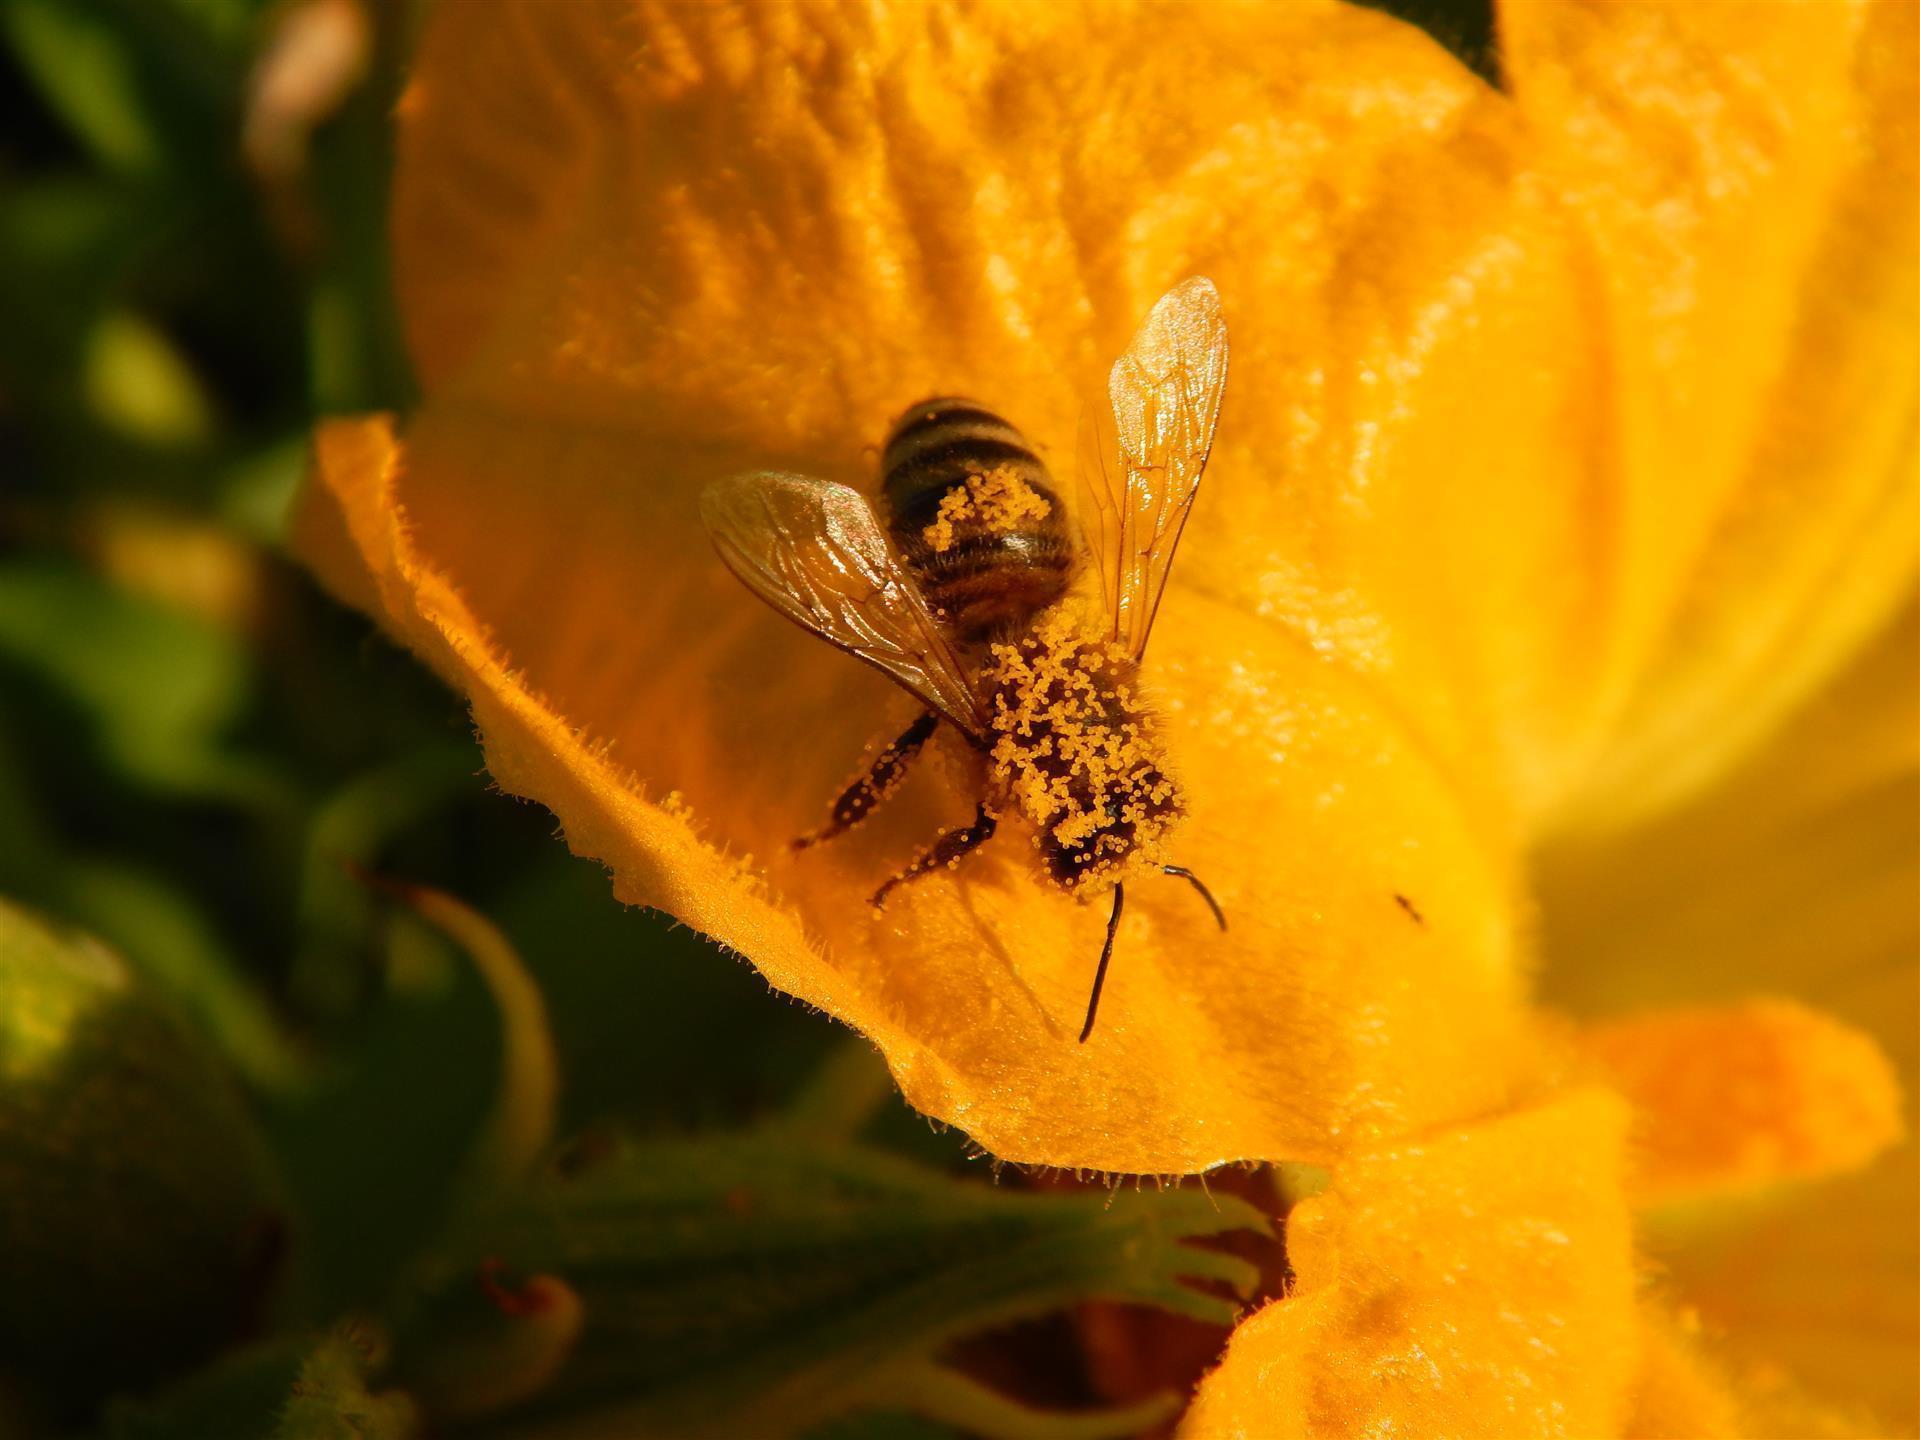 Ropotarnica - mestni vrt pod Gorco - čebela